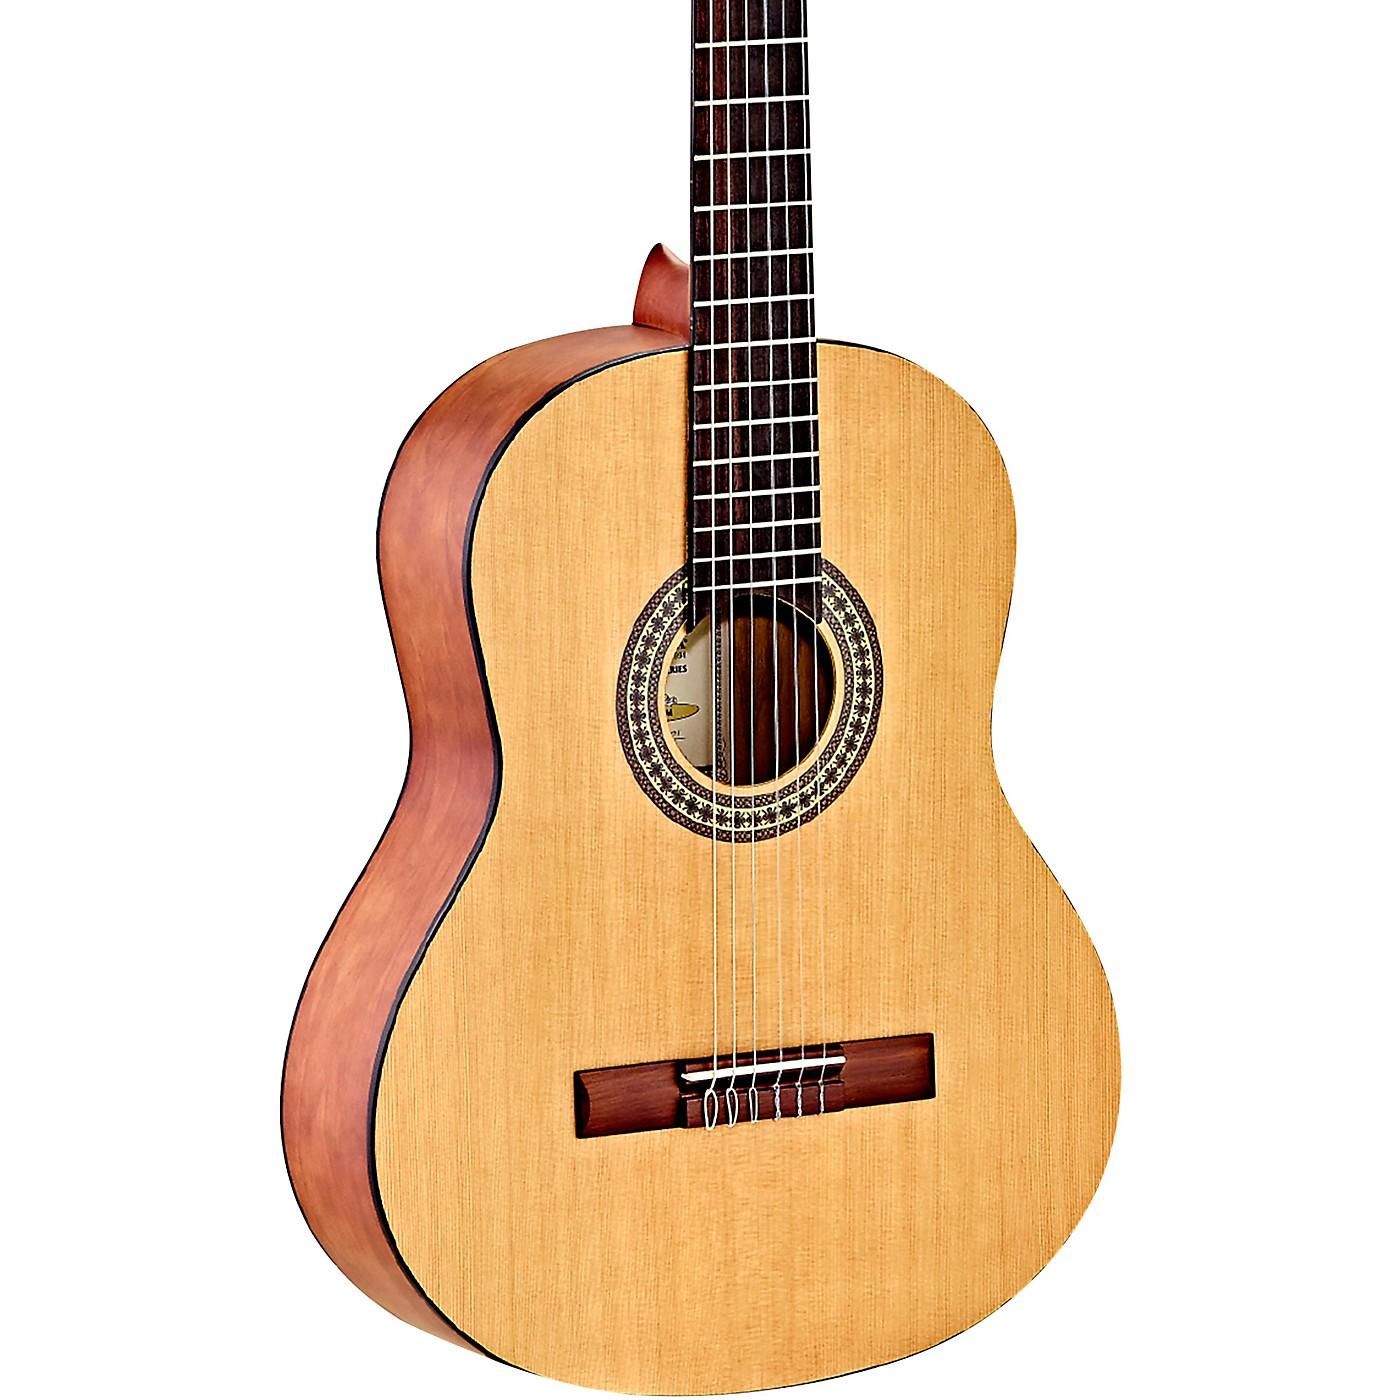 Ortega RST5CM Student Series Full Size Acoustic Classical Guitar thumbnail